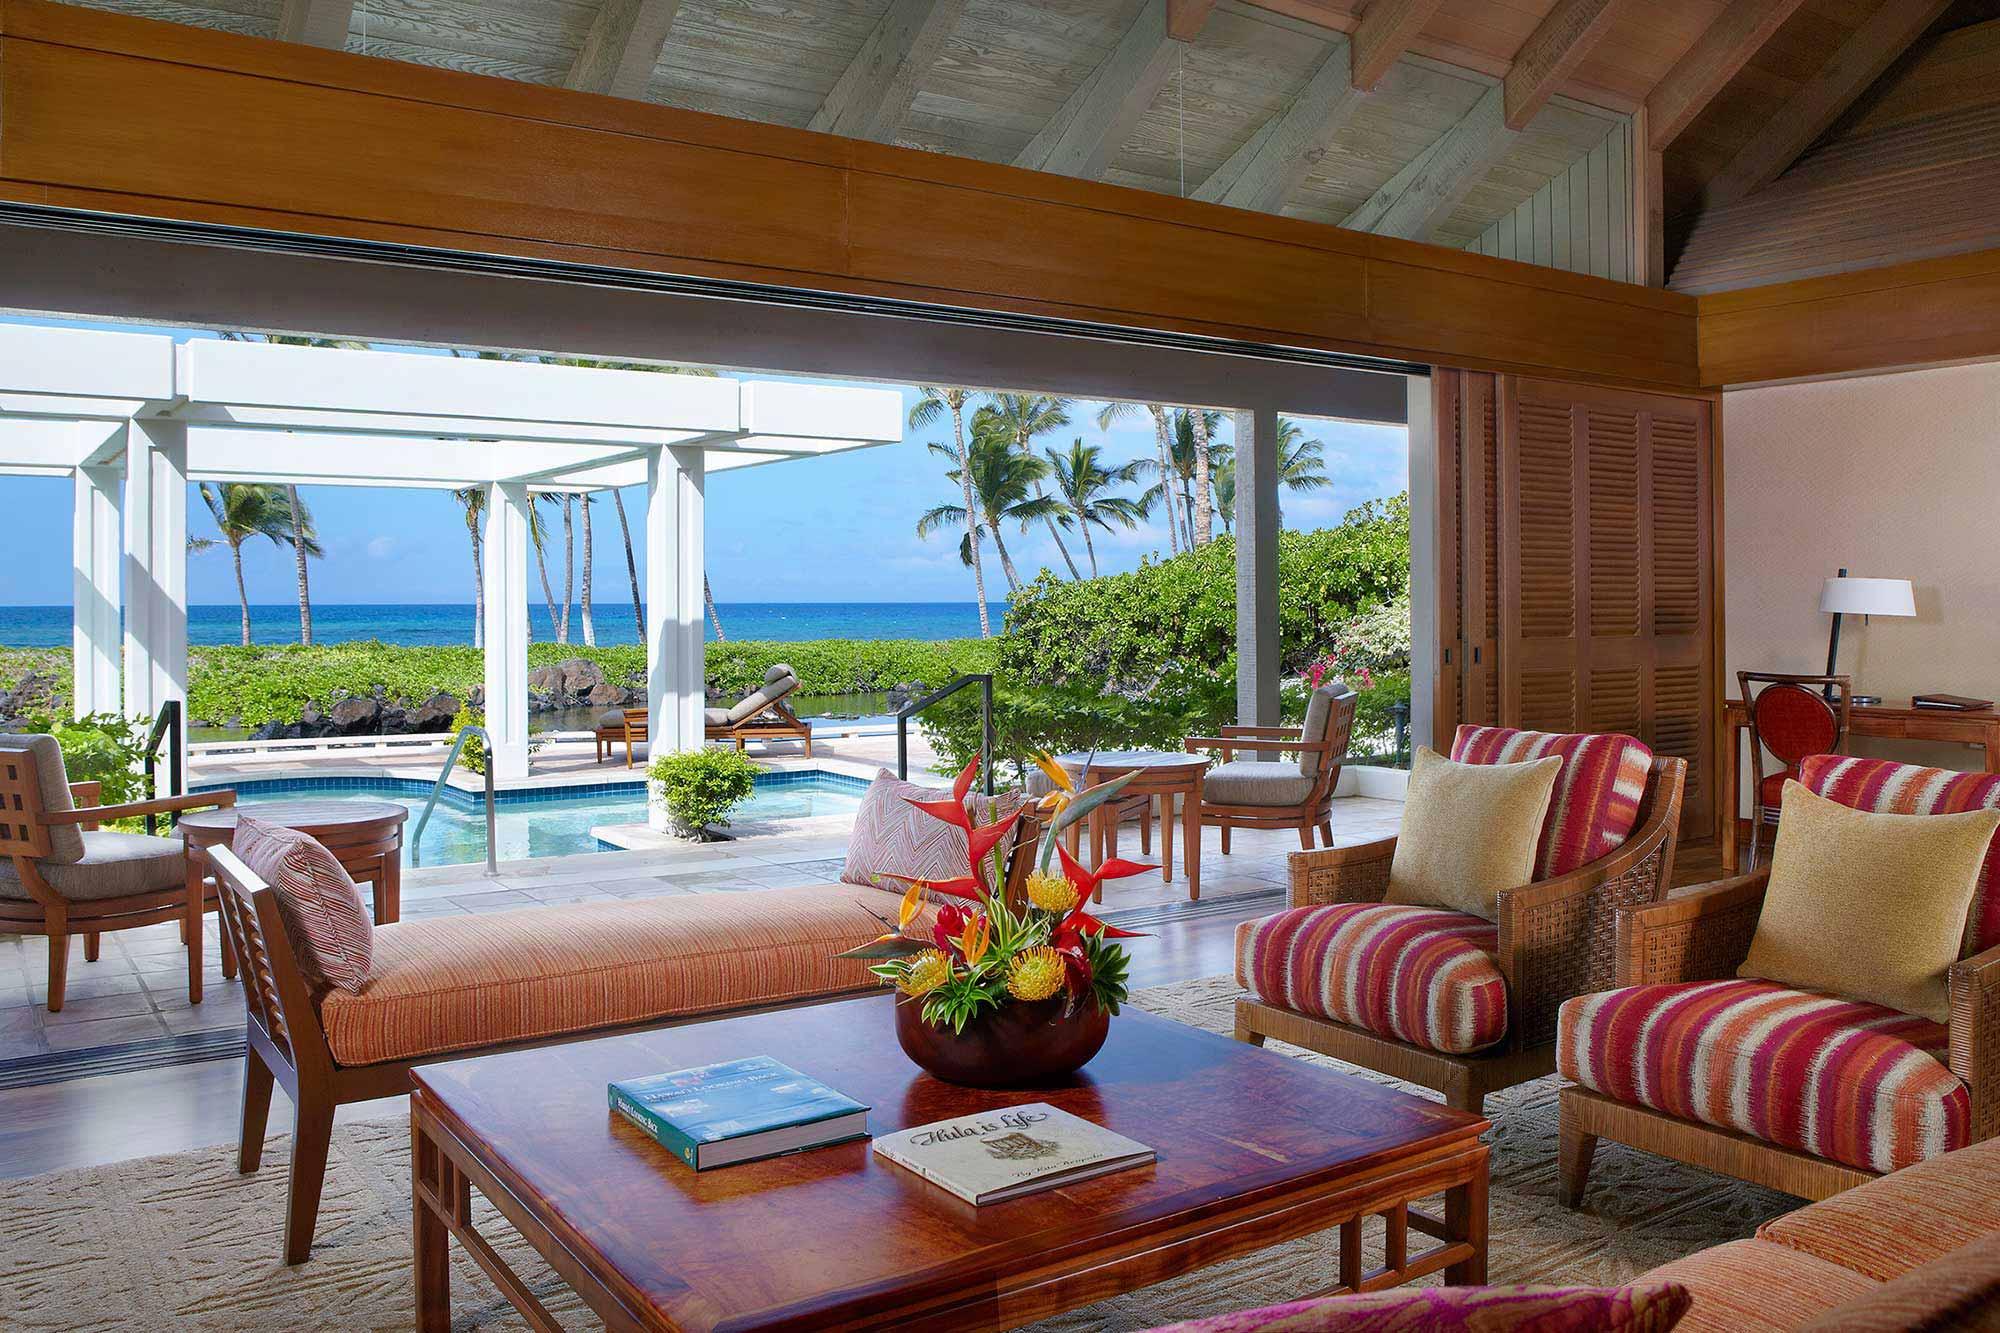 Mauna-Lani-Ocean-Front-Bungalow-Living-Room